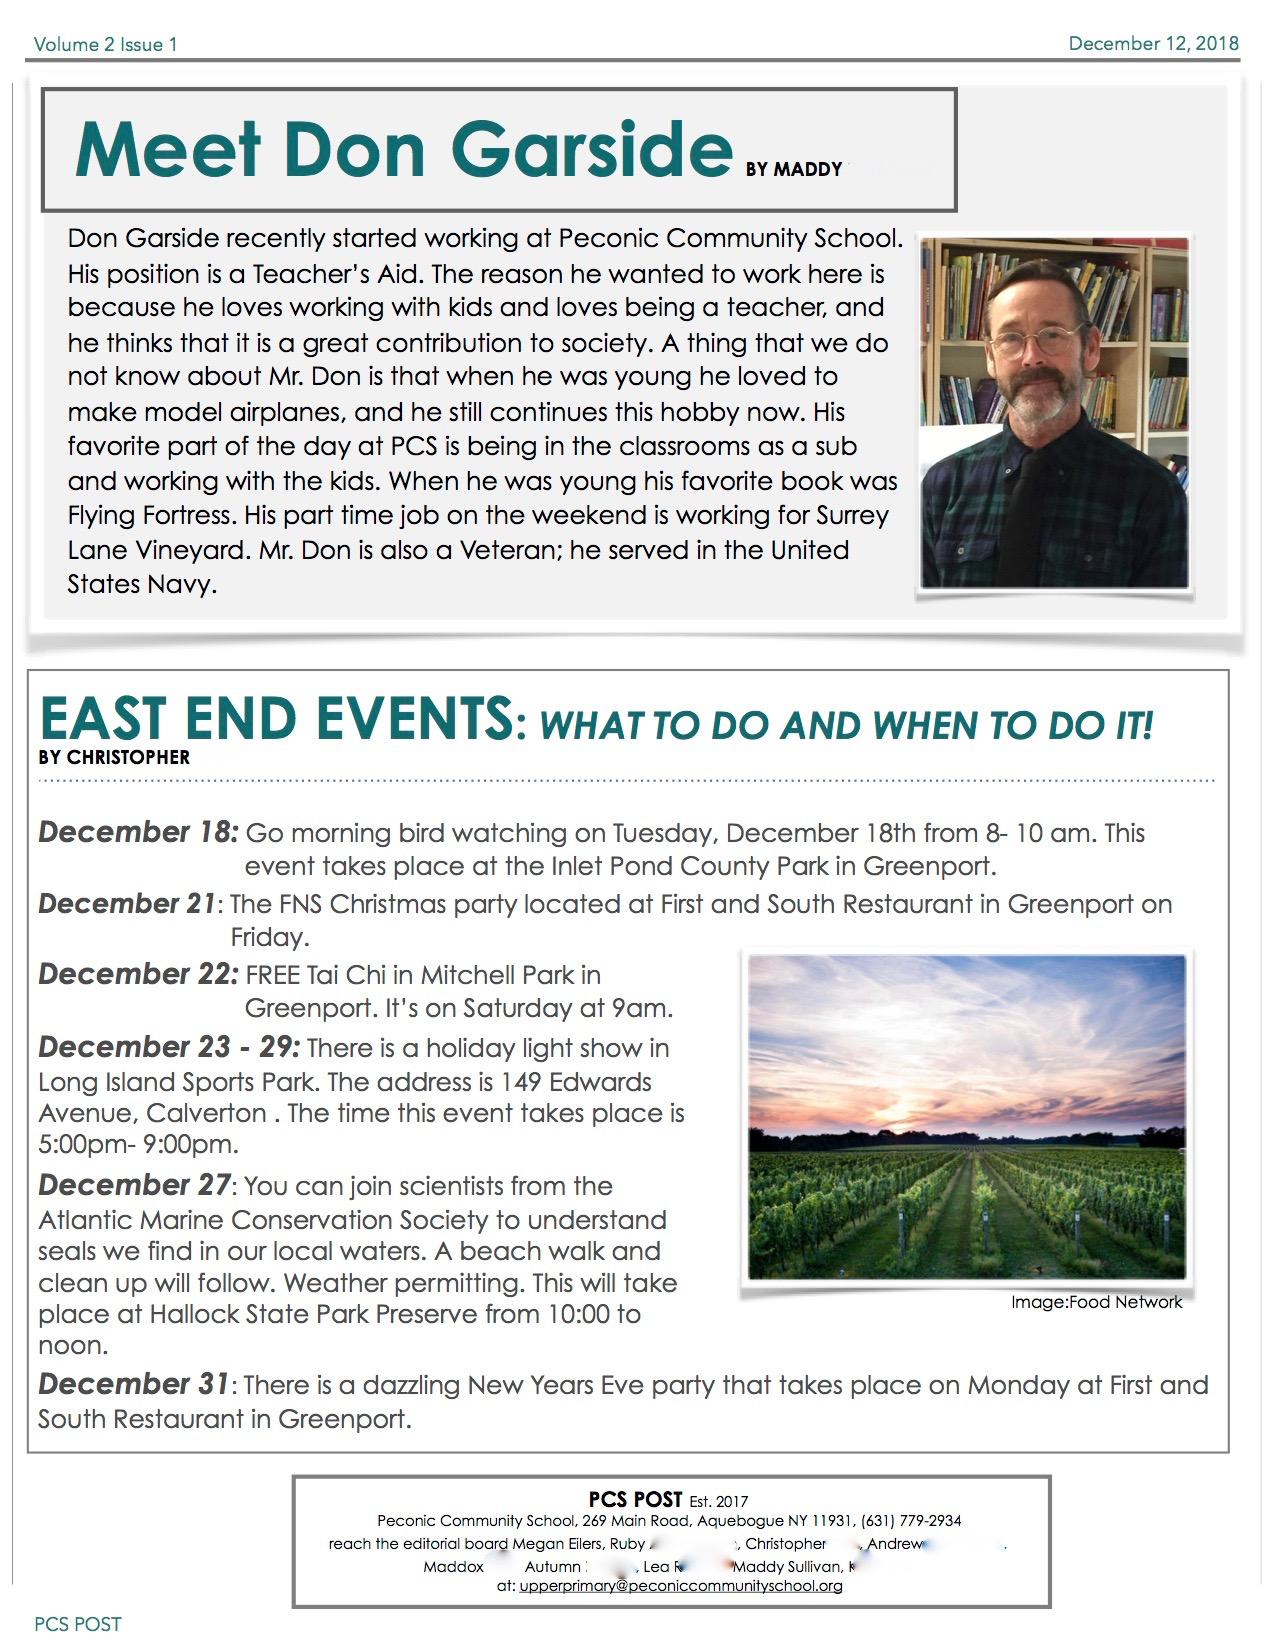 PCS POST vol 2 issue 1 pg 12 JPEG (1).jpg